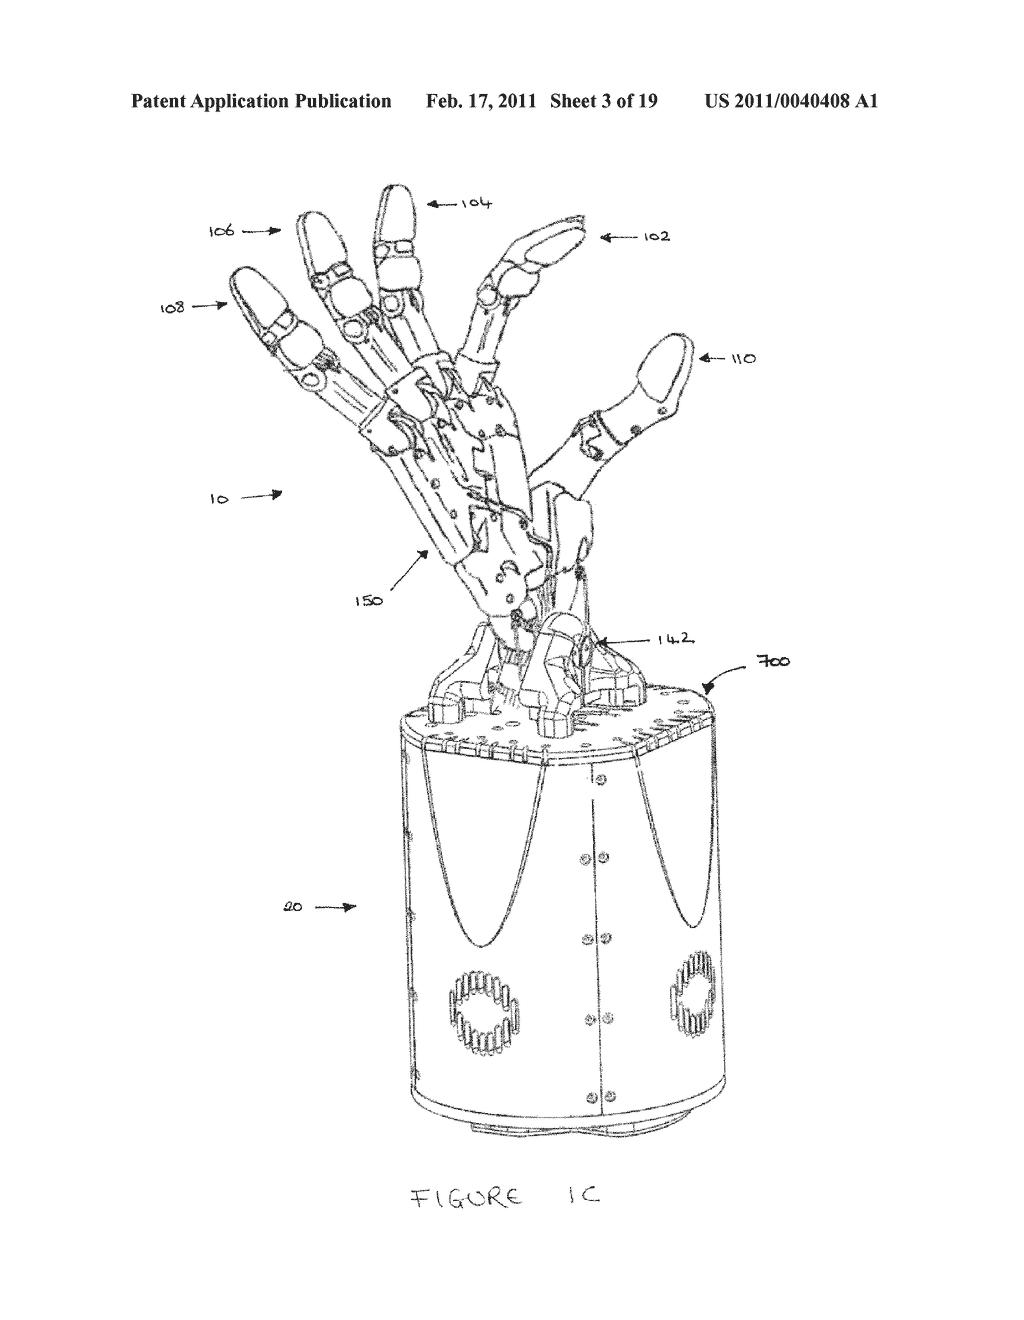 Robot Hand Diagram Wiring Libraries Schema Ramps 14 Simple Postrobotic Robotic Arm